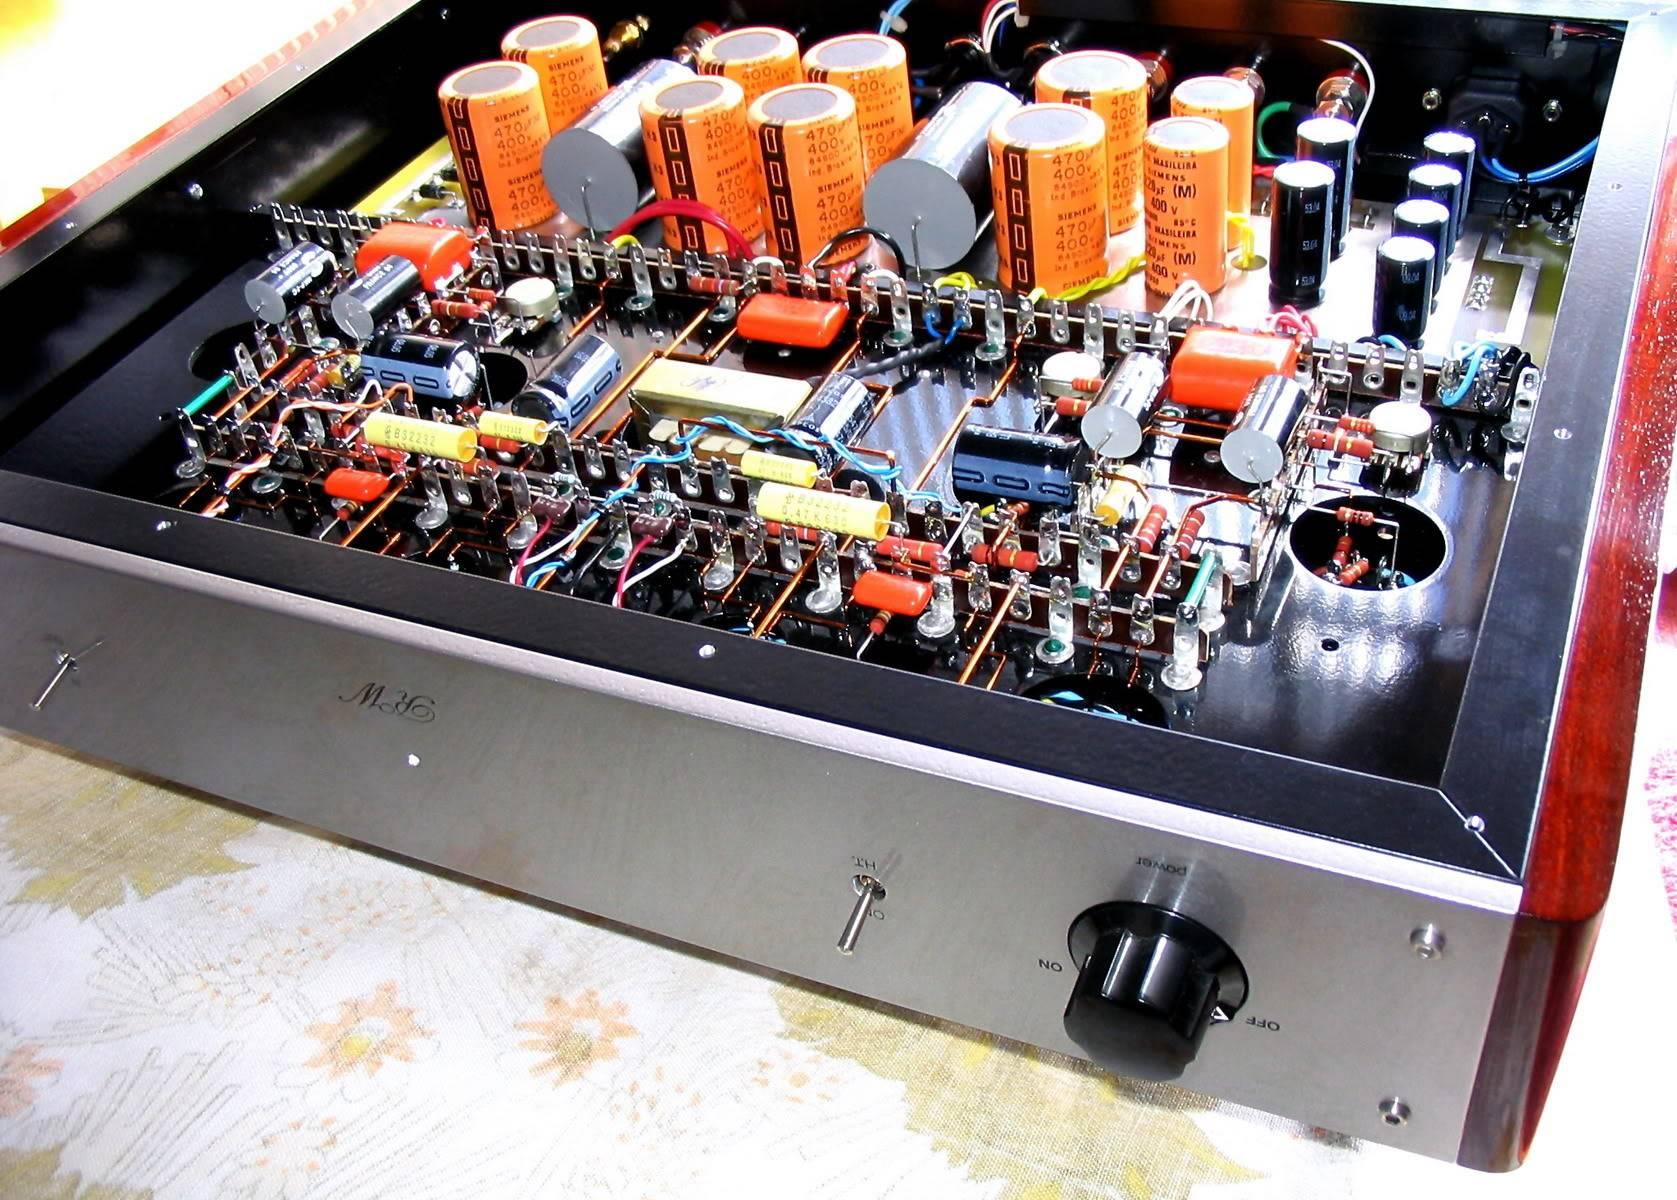 Amps a válvulas chineses: opiniões? - Página 3 VTR_RW_2x60_d